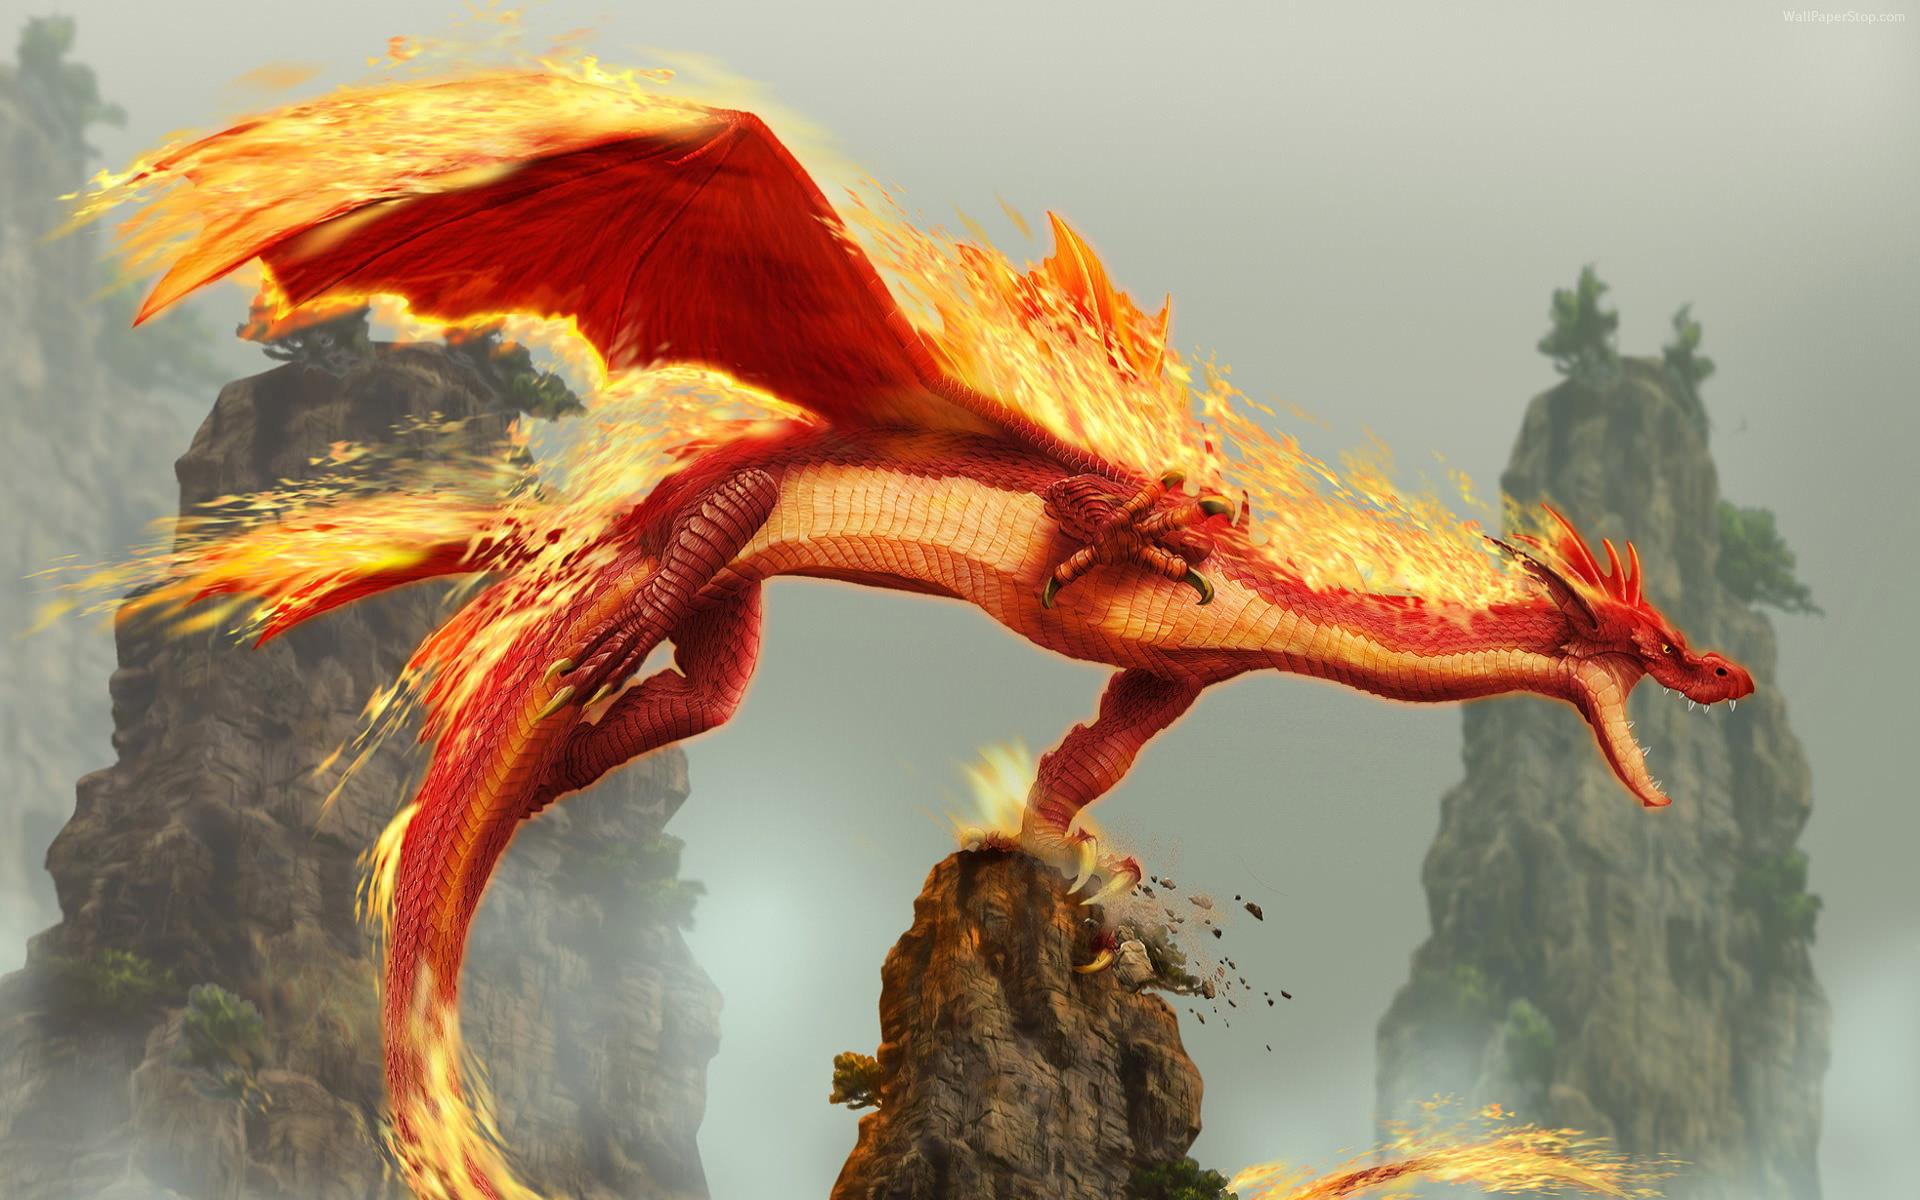 Red Fire Dragon wallpaper   91105 1920x1200